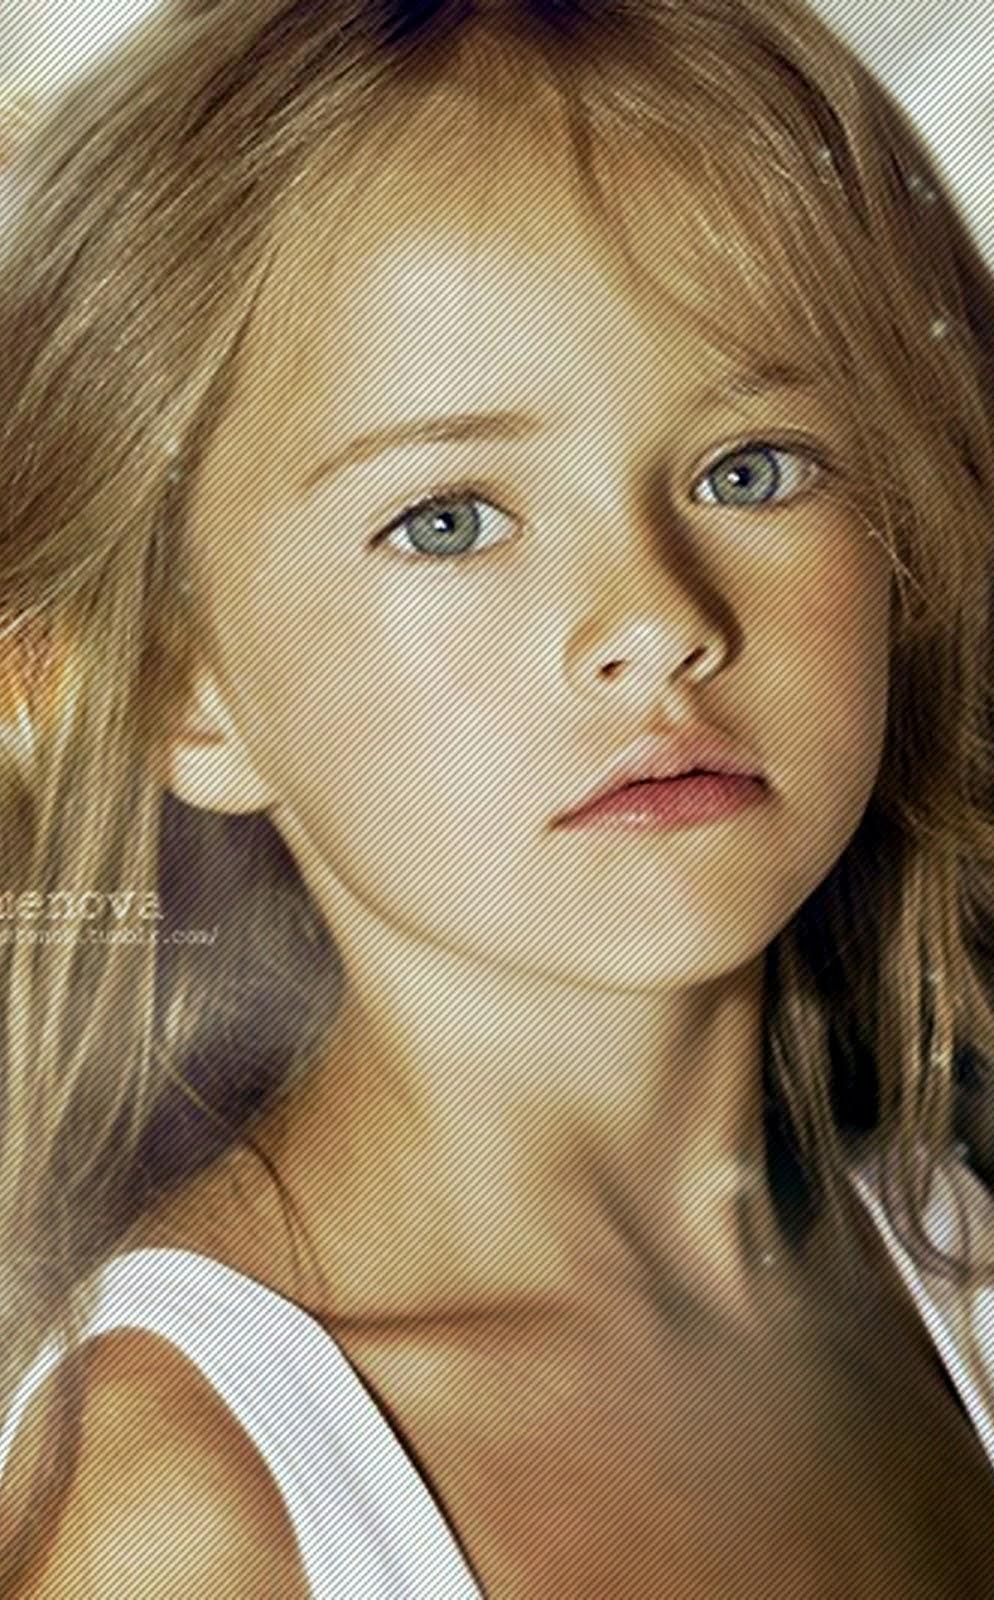 KRISTINA PIMENOVA CHILD MODEL RUSSIA MOSCOW 1932 X 1200